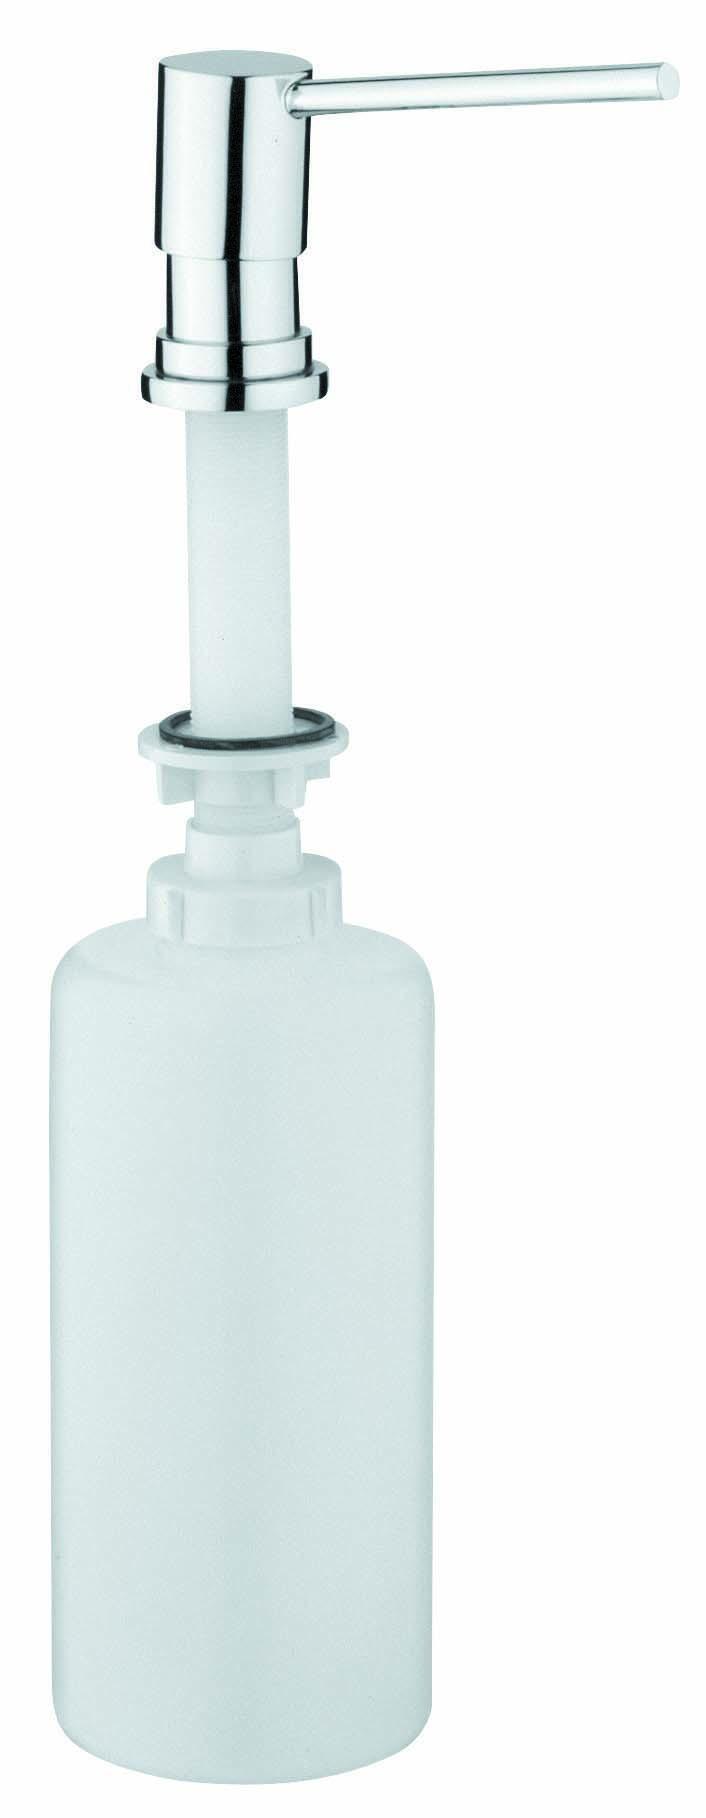 Arkitekta Built-in Liquid Soap Dispenser